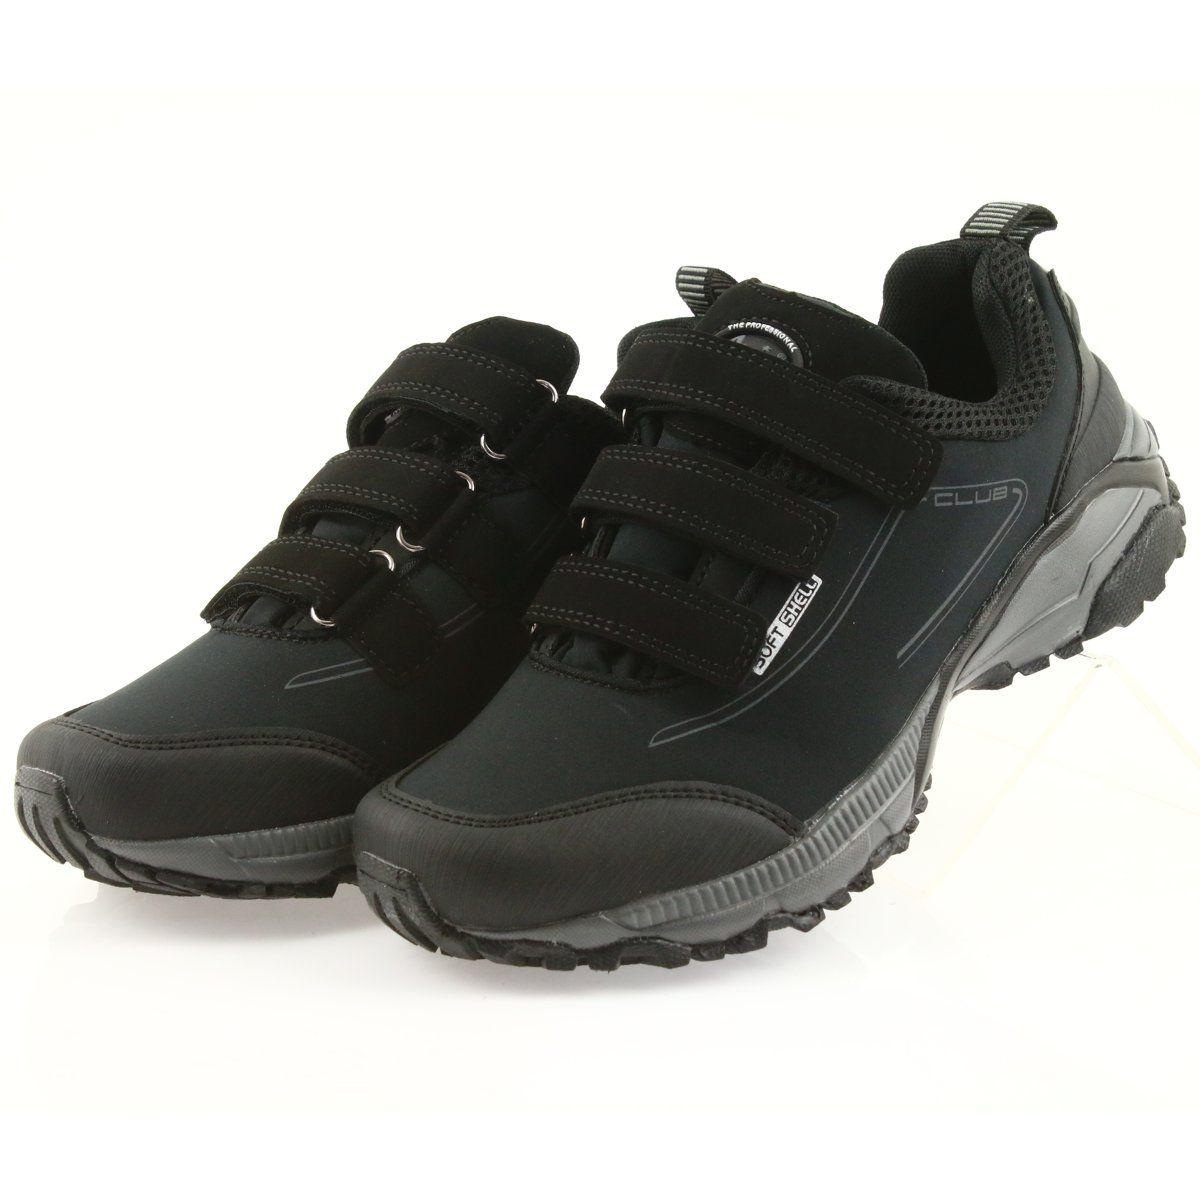 American Club Adi Buty Damskie Sportowe Na Rzepy American Wodoodporne Softhell Wt08 19 Czarne Sport Shoes Women Club Shoes Trekking Shoes